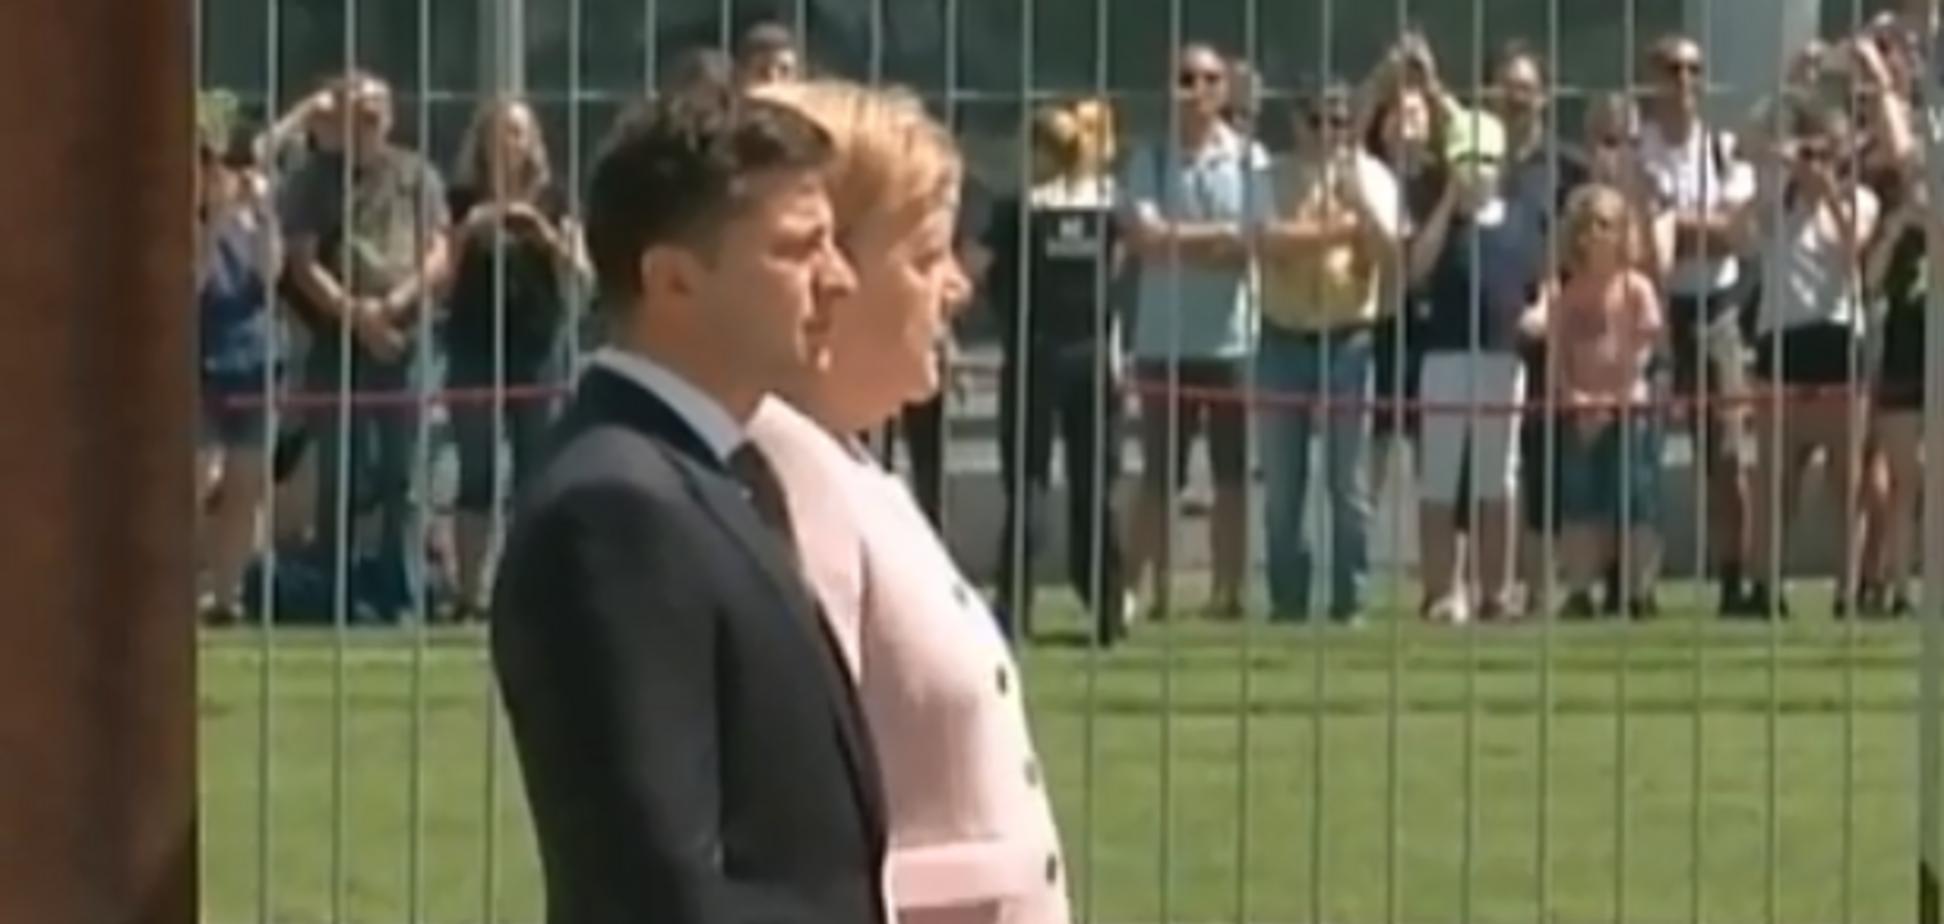 Меркель затрясло рядом с Зеленским: момент попал на видео